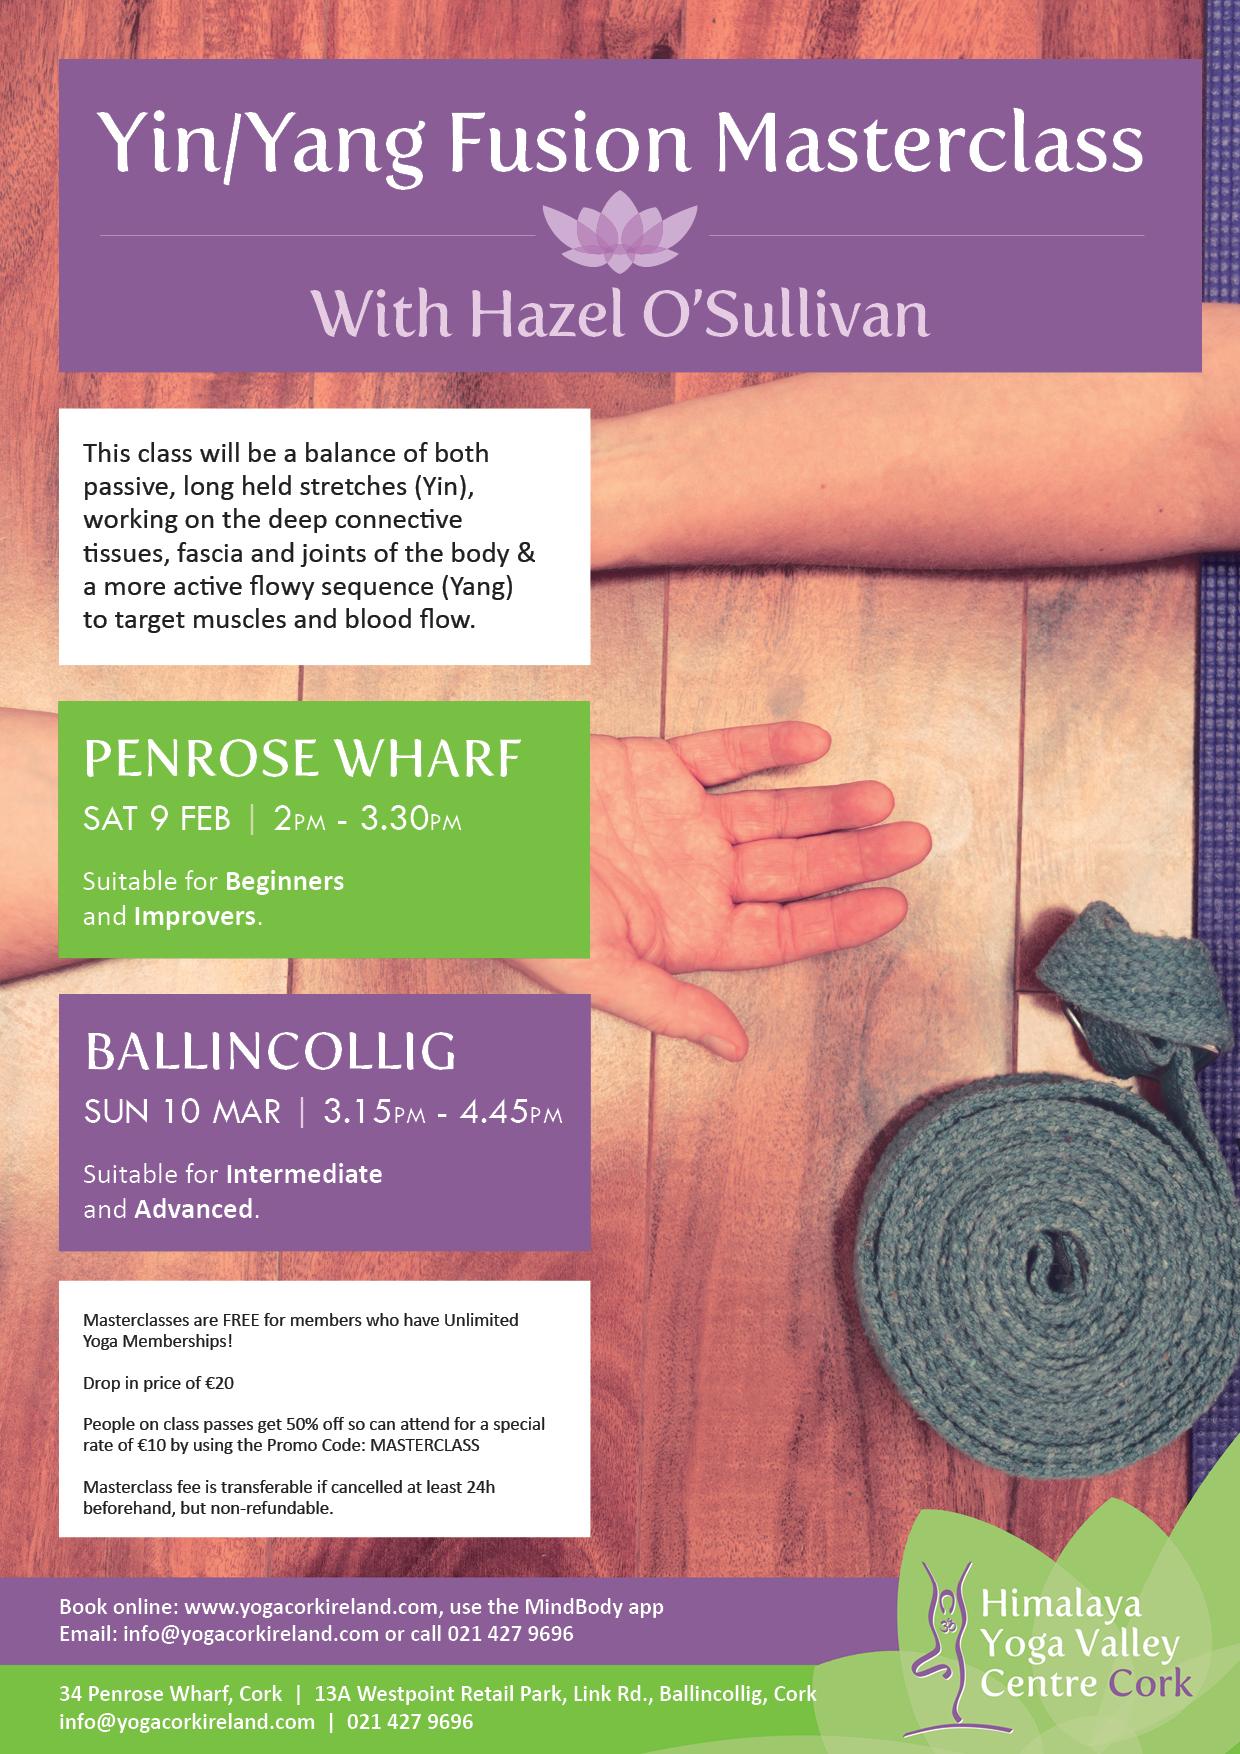 Yin/Yang Fusion Masterclasses With Hazel O'Sullivan   Himalaya Yoga